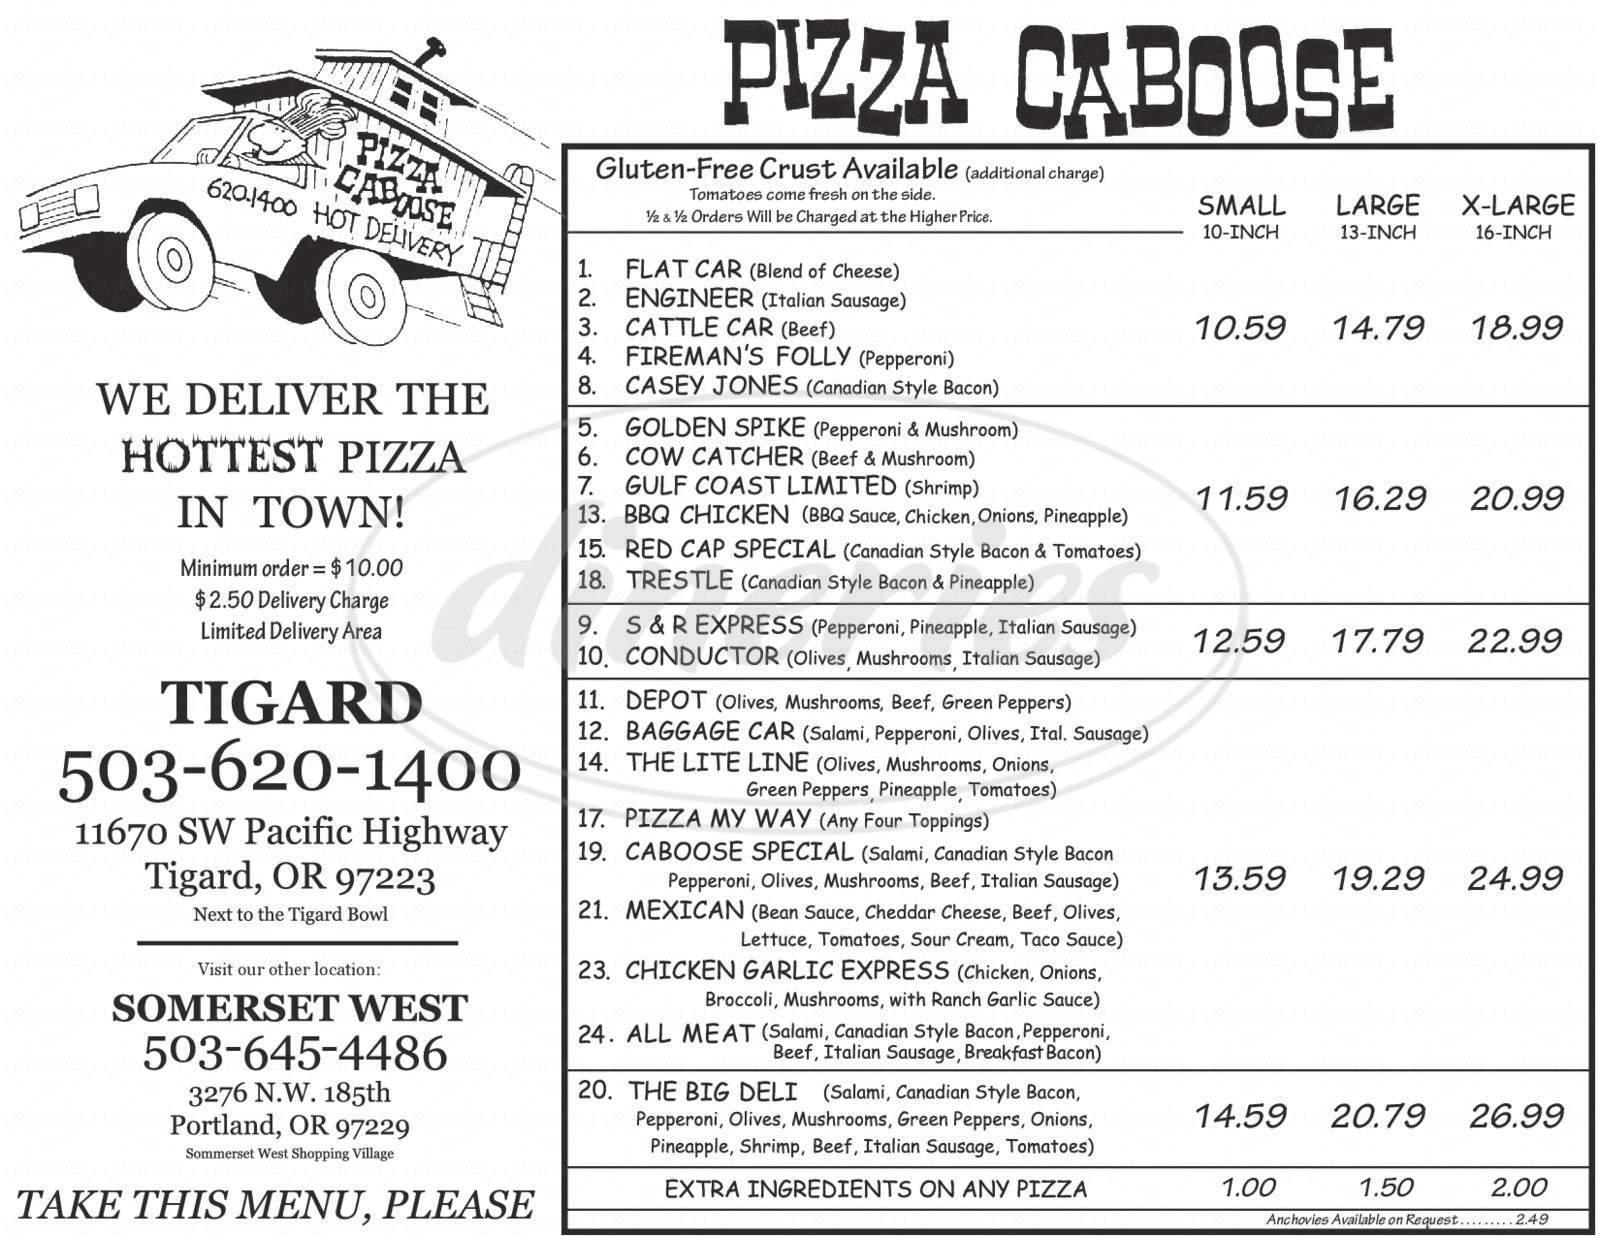 pizza caboose